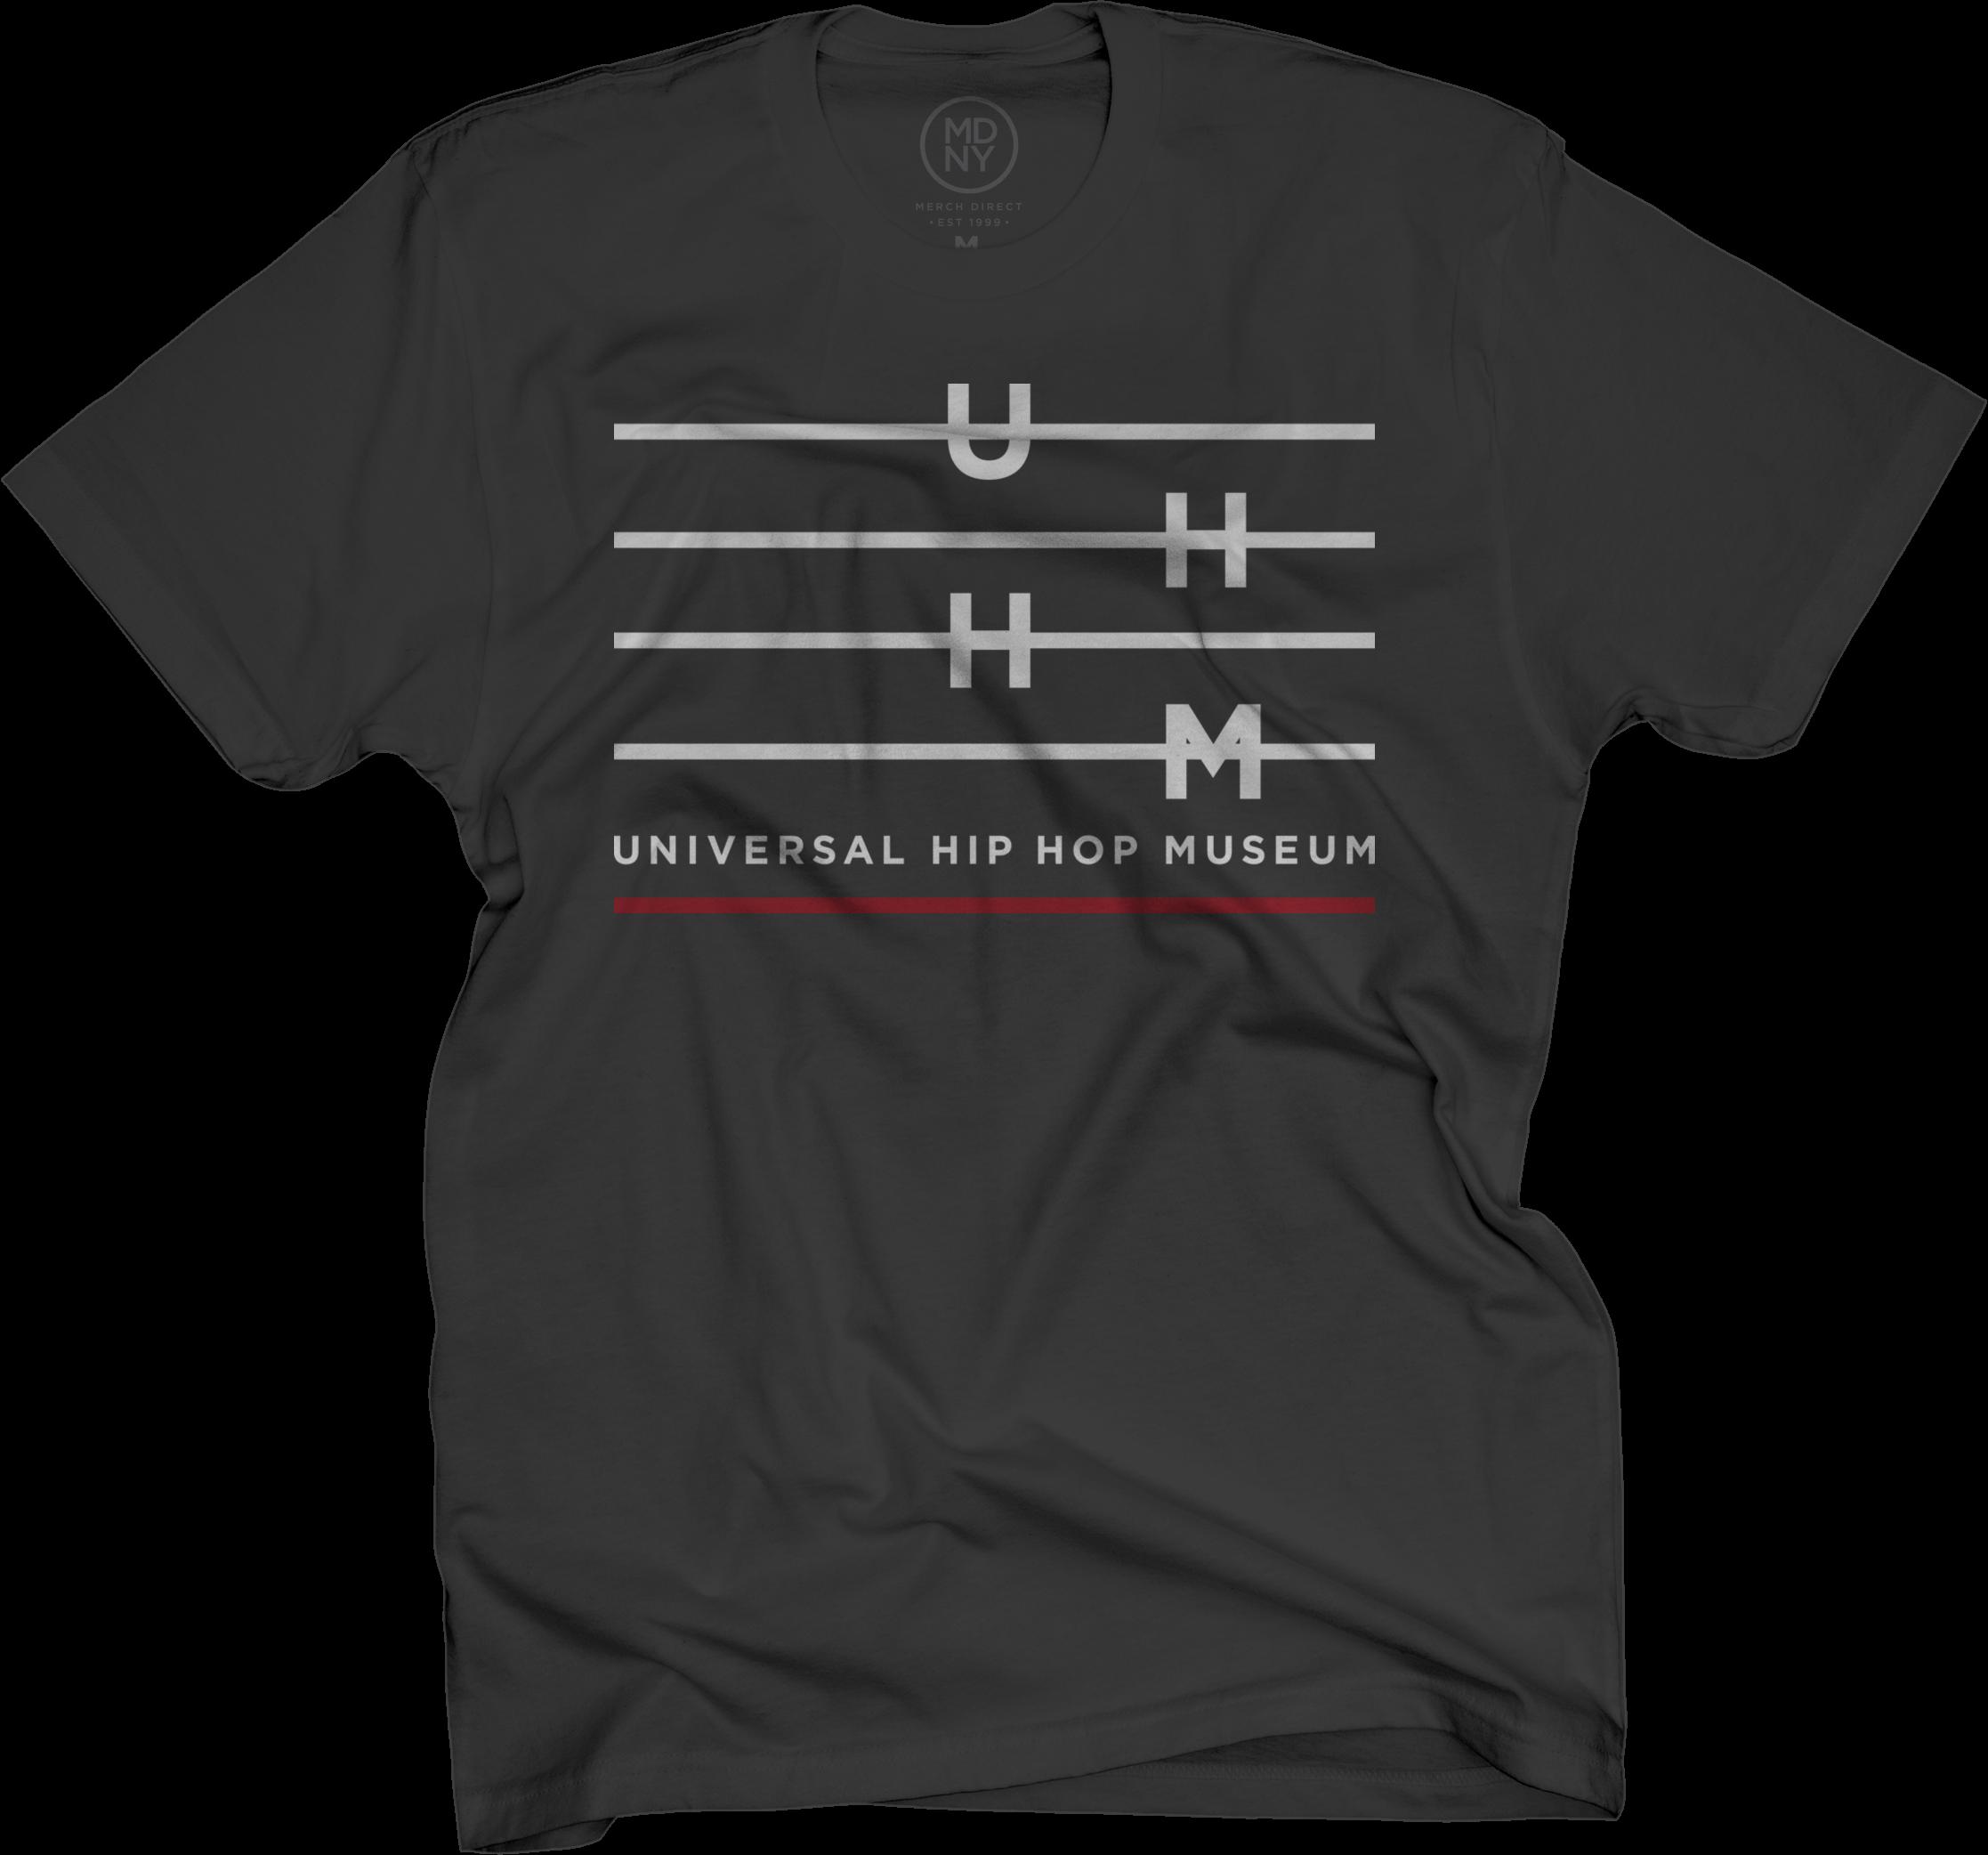 UHHM Black T-Shirt